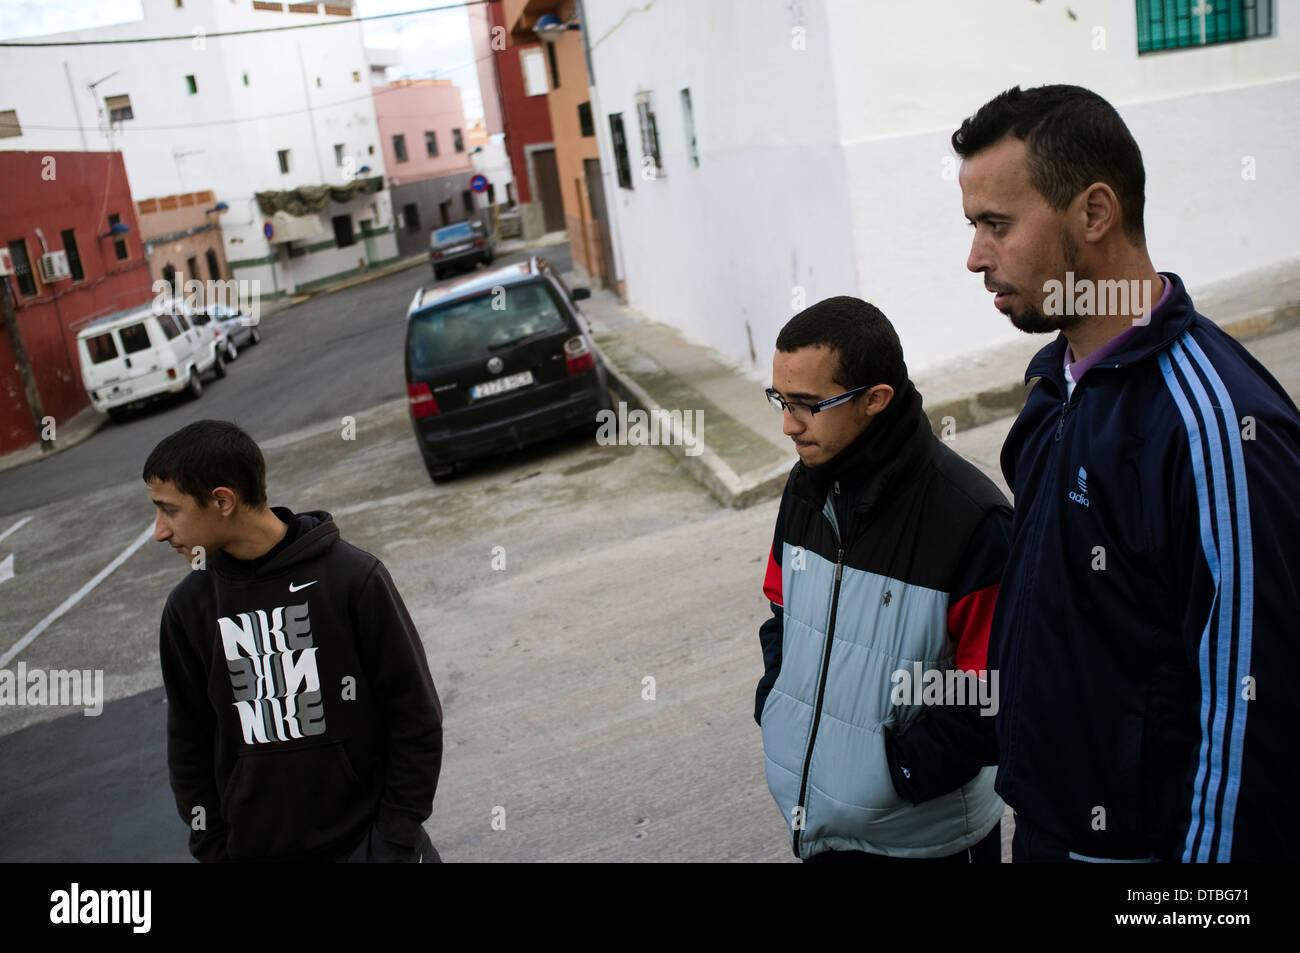 Islamic neighbourhood of Monte Maria Cristina in Melilla, Spain. poverty poor jobless suburb - Stock Image